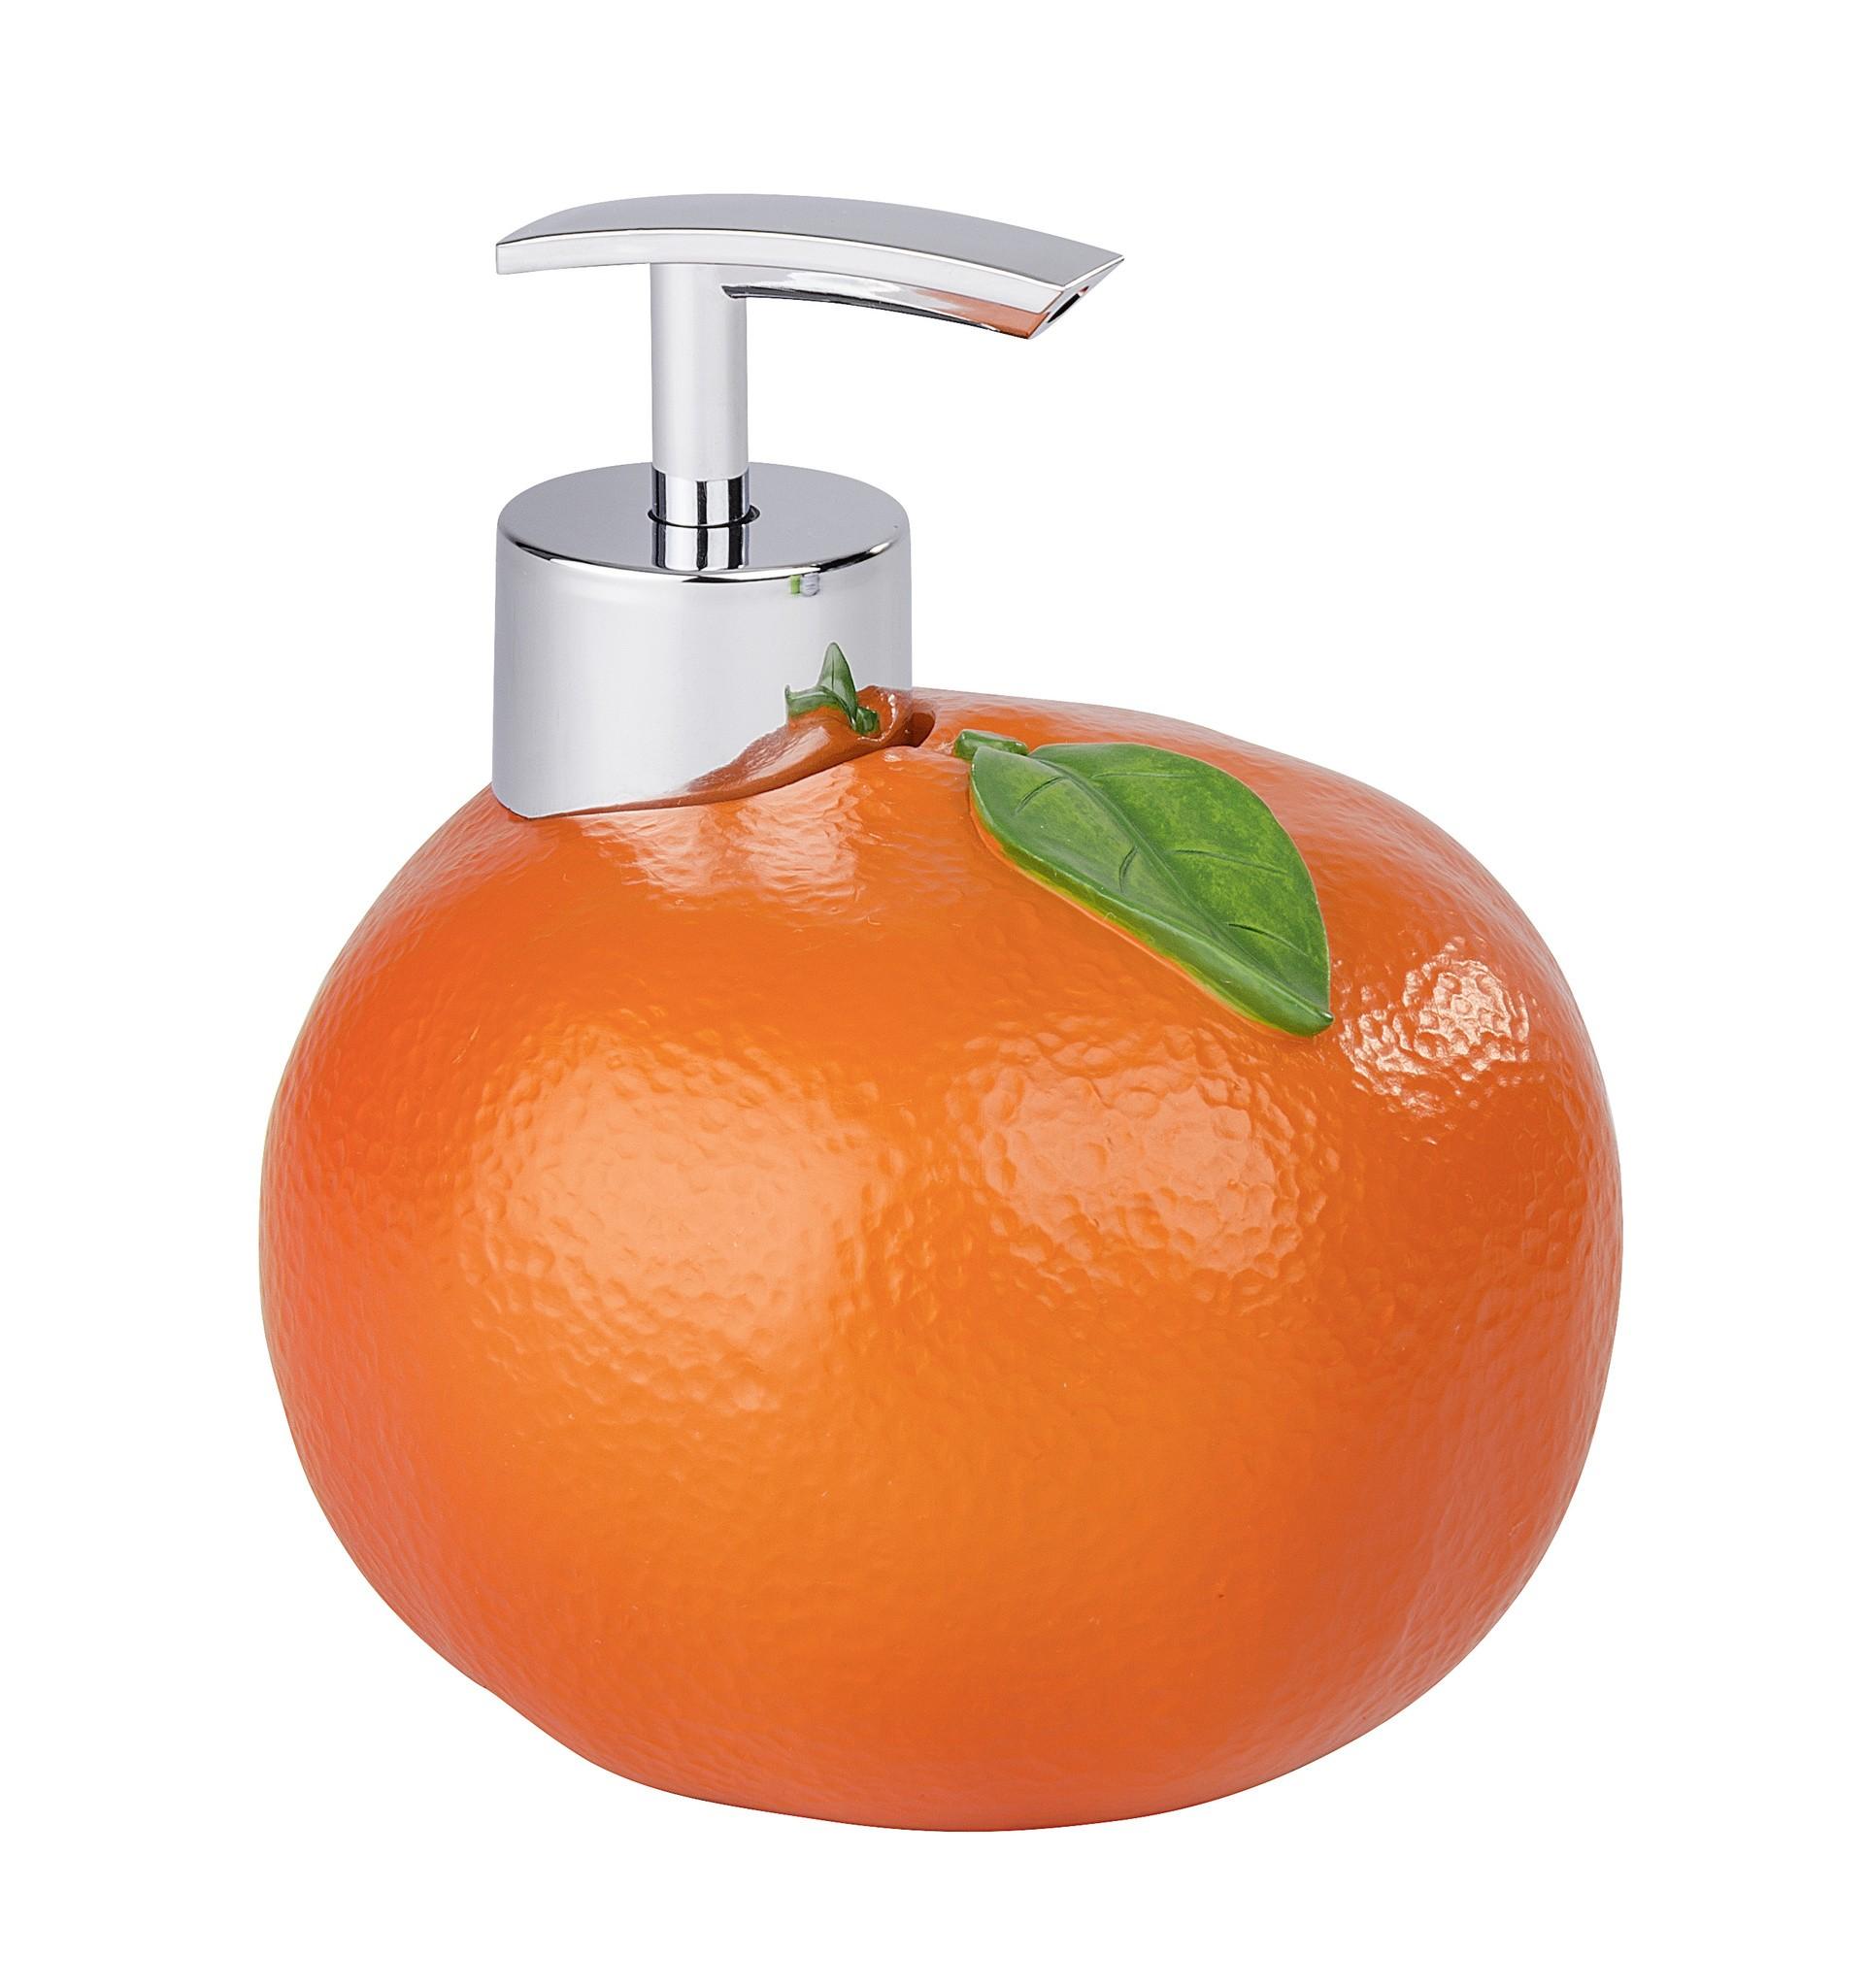 Wenko Seifenspender Orange, Spülmittelspender, 300 ml